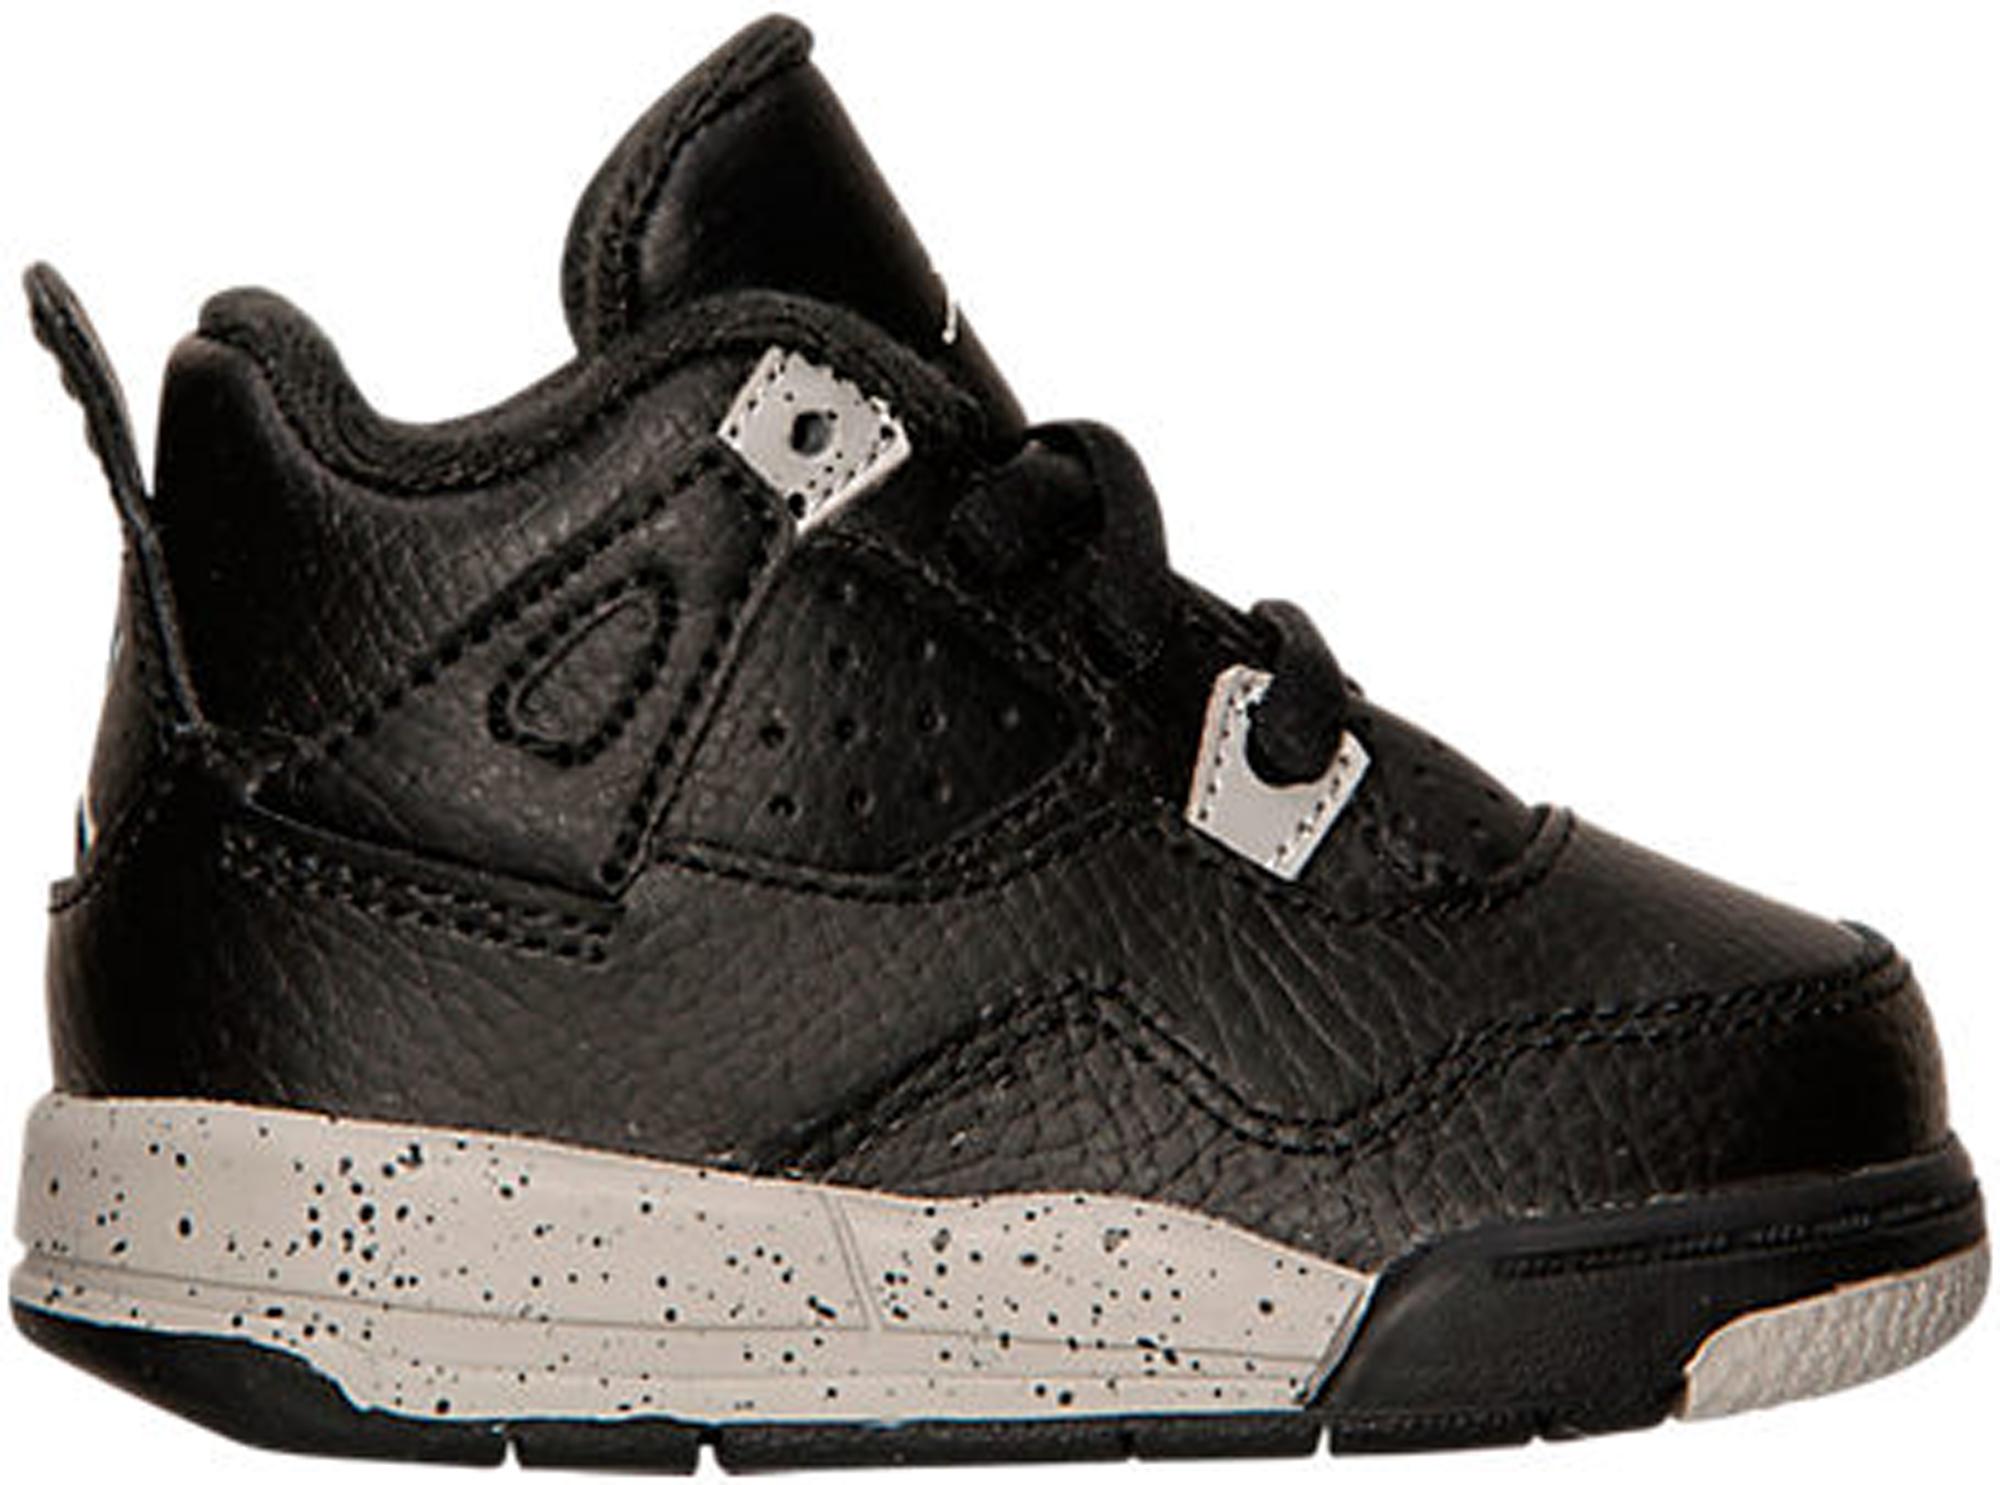 New 2015 Nike Air Jordan IV Oreo Cheap sale